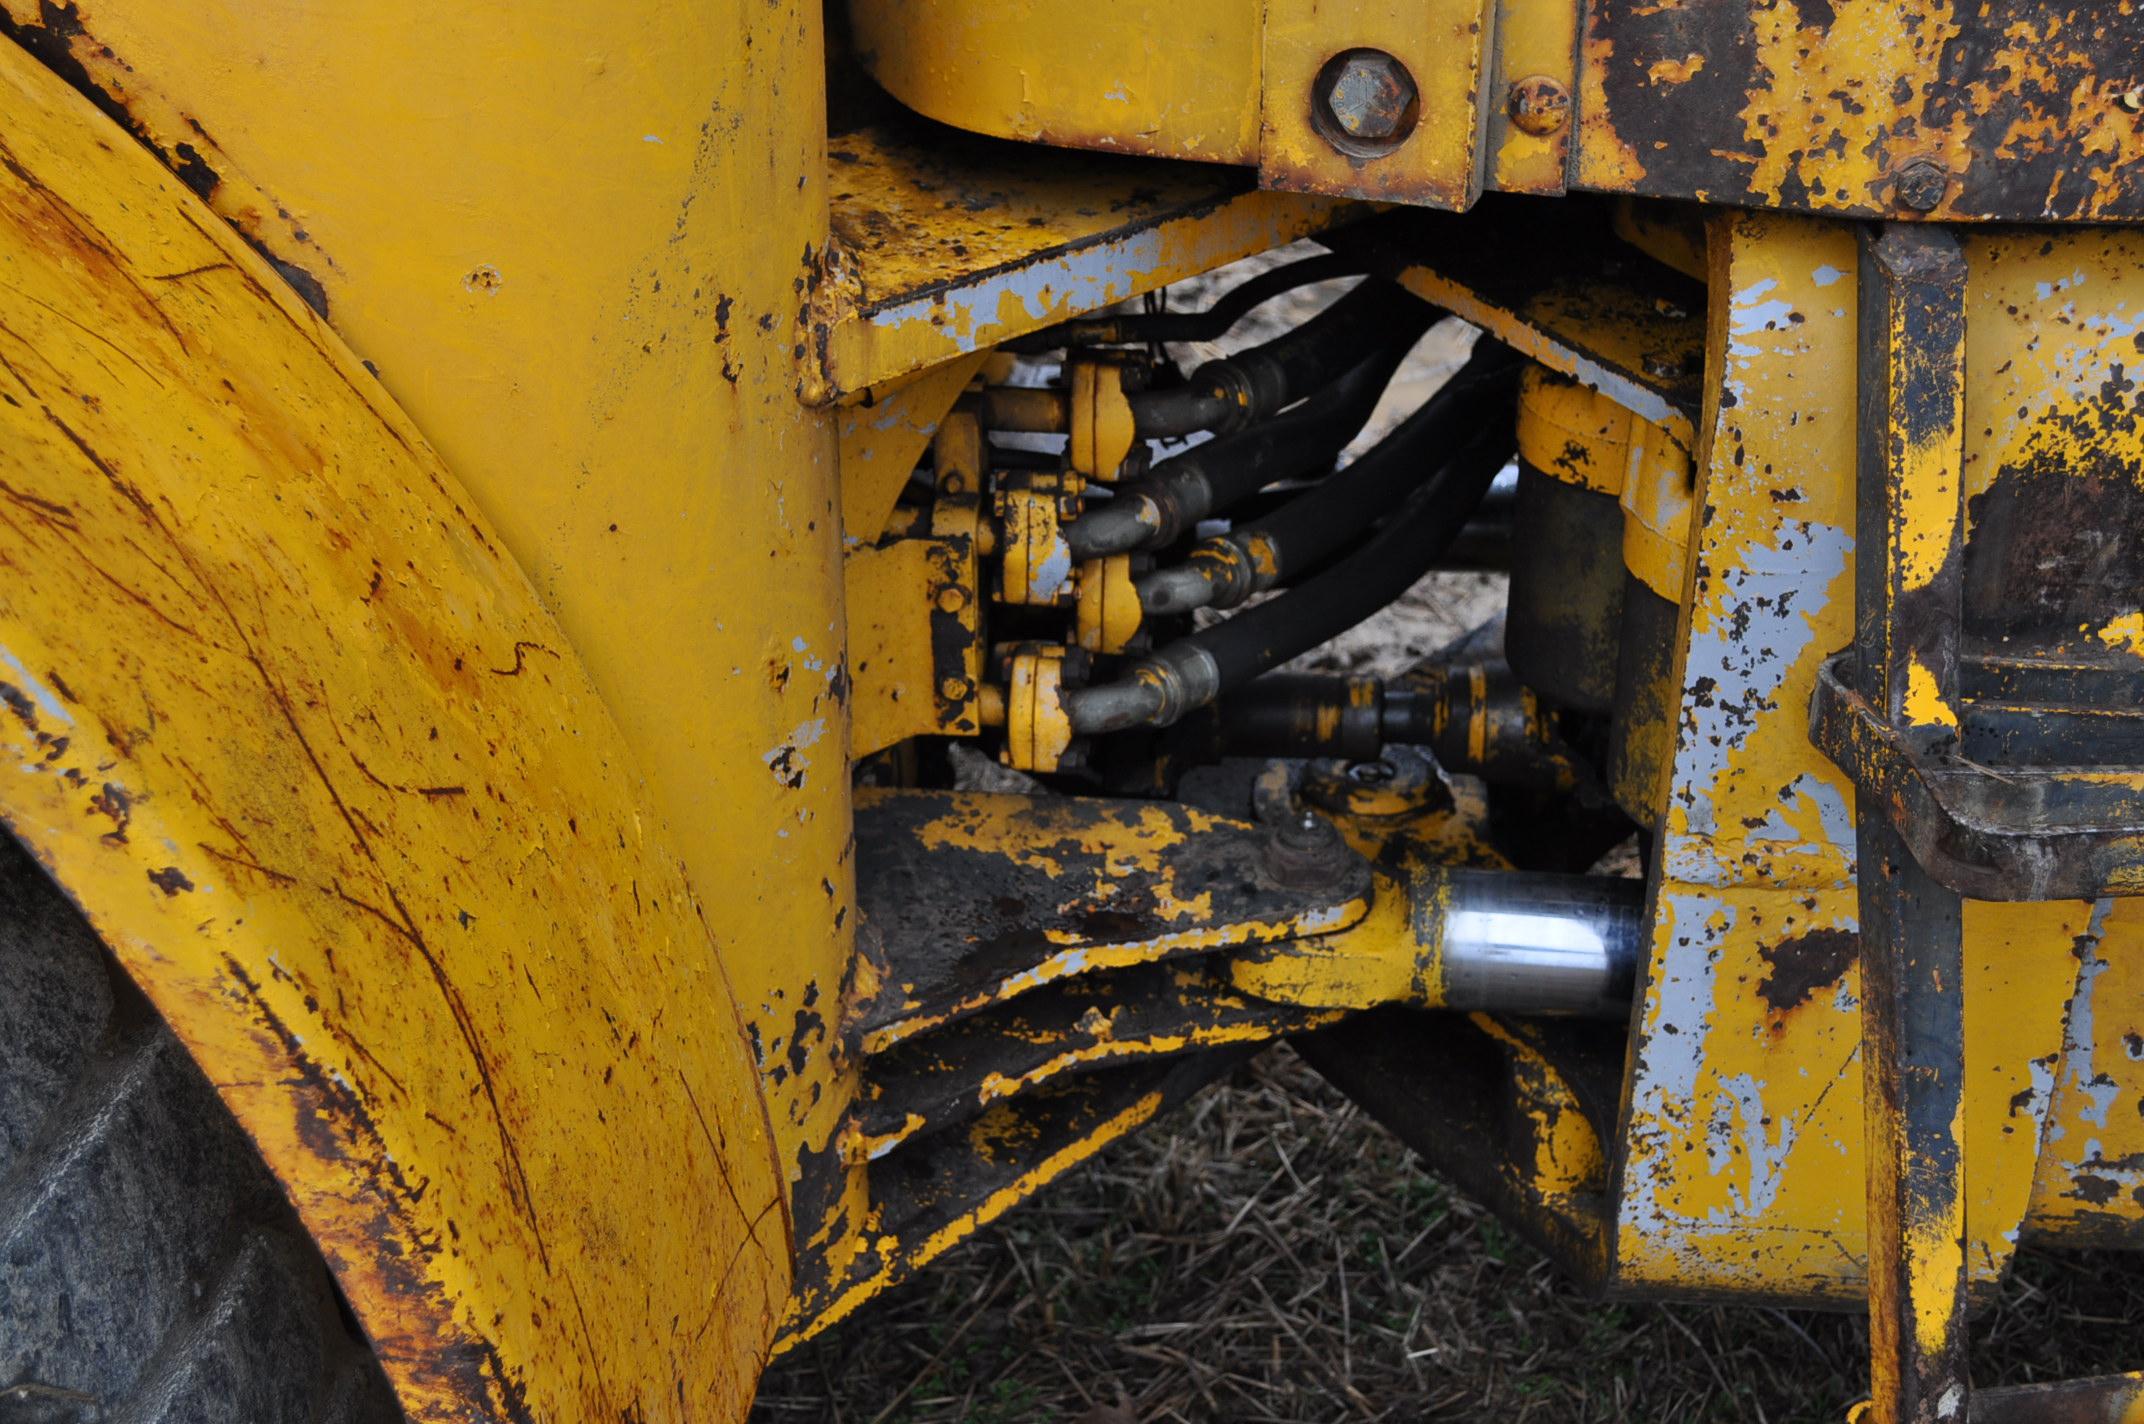 John Deere 544 Payloader, 17.5-25 tires, shows 1074 hrs, SN 0767621 - Image 11 of 16